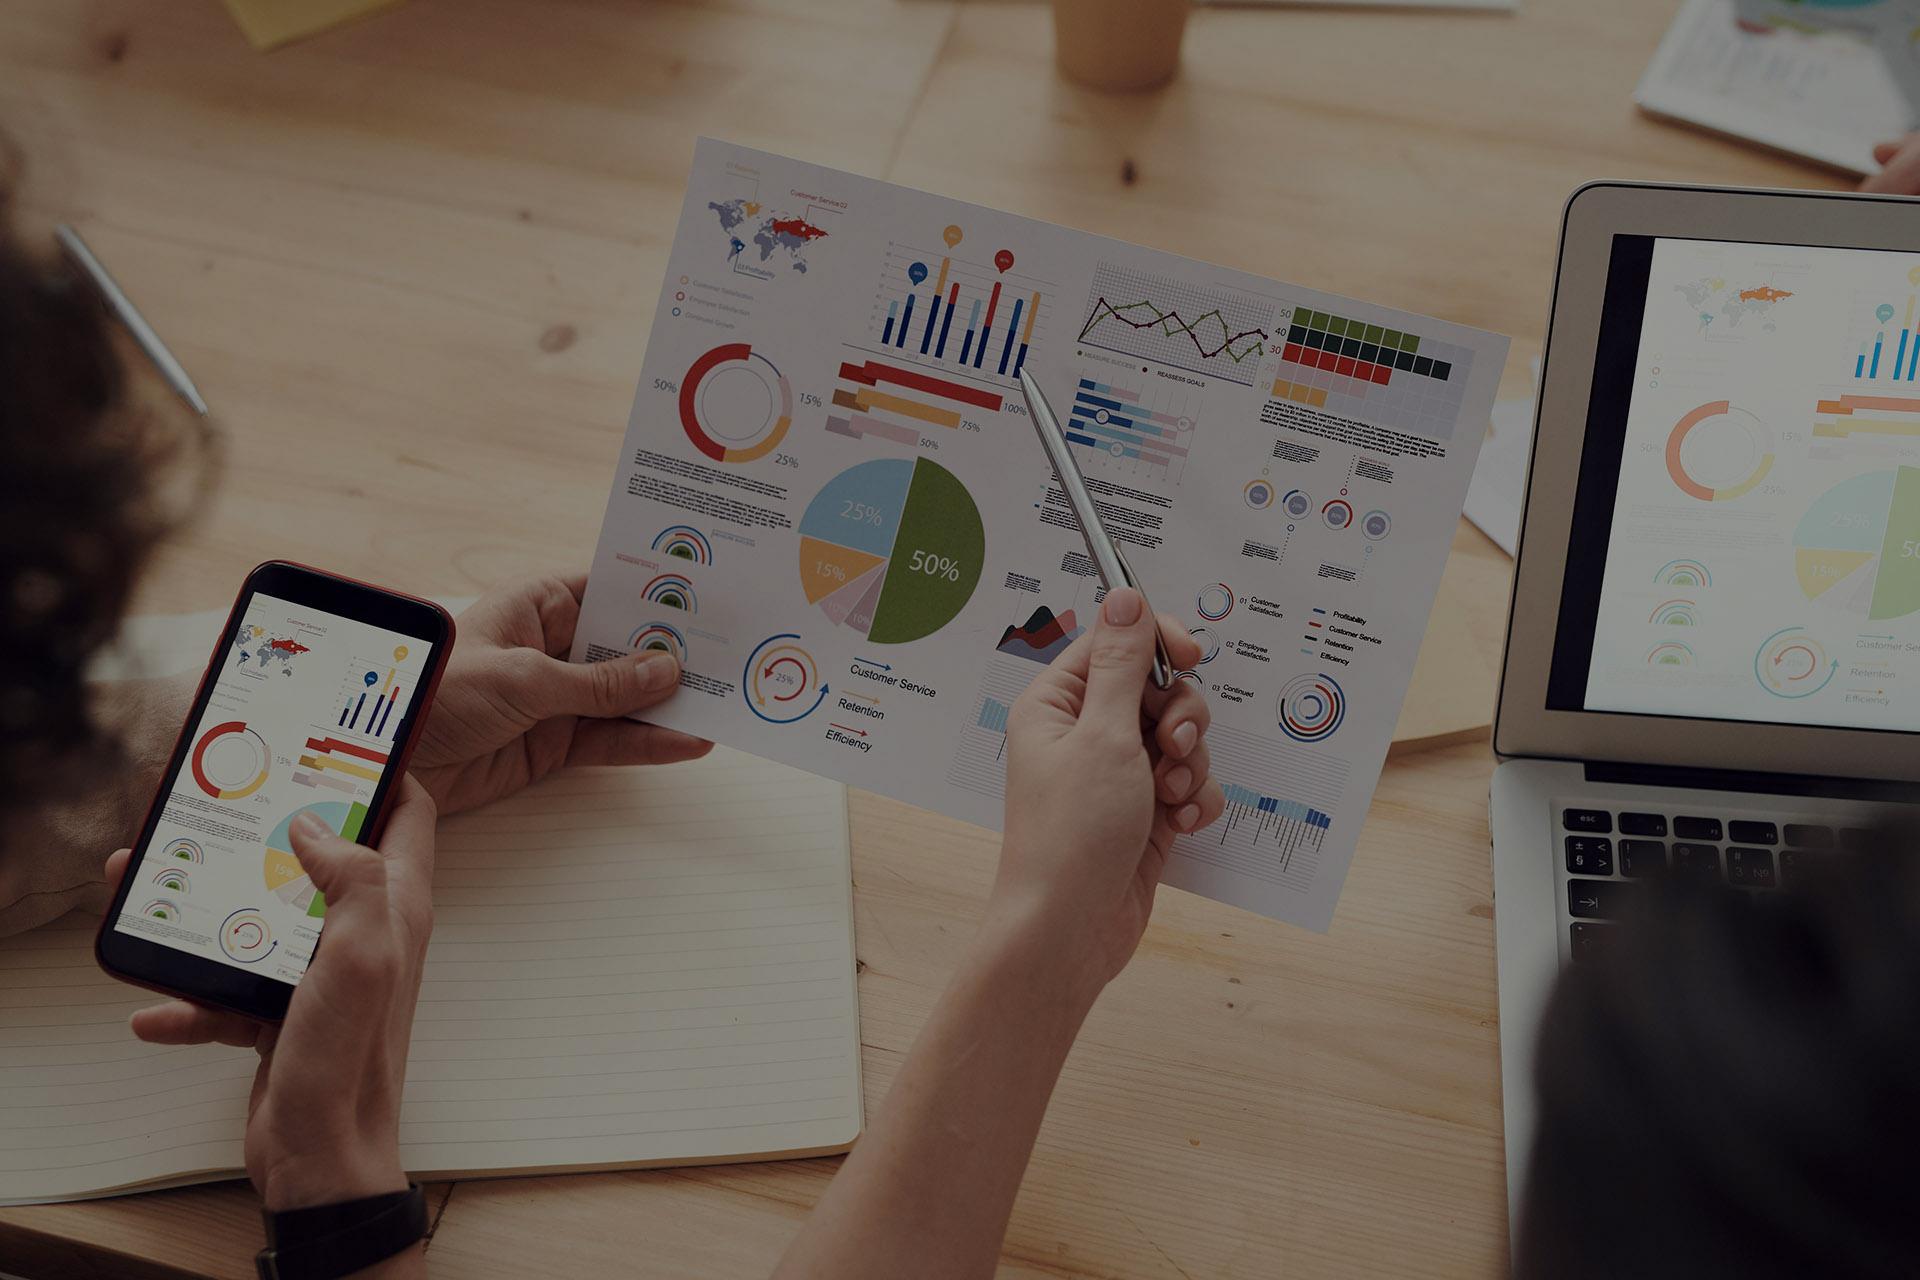 Cortex - Web Design | Brand identity | Digital Marketing | Mobile apps